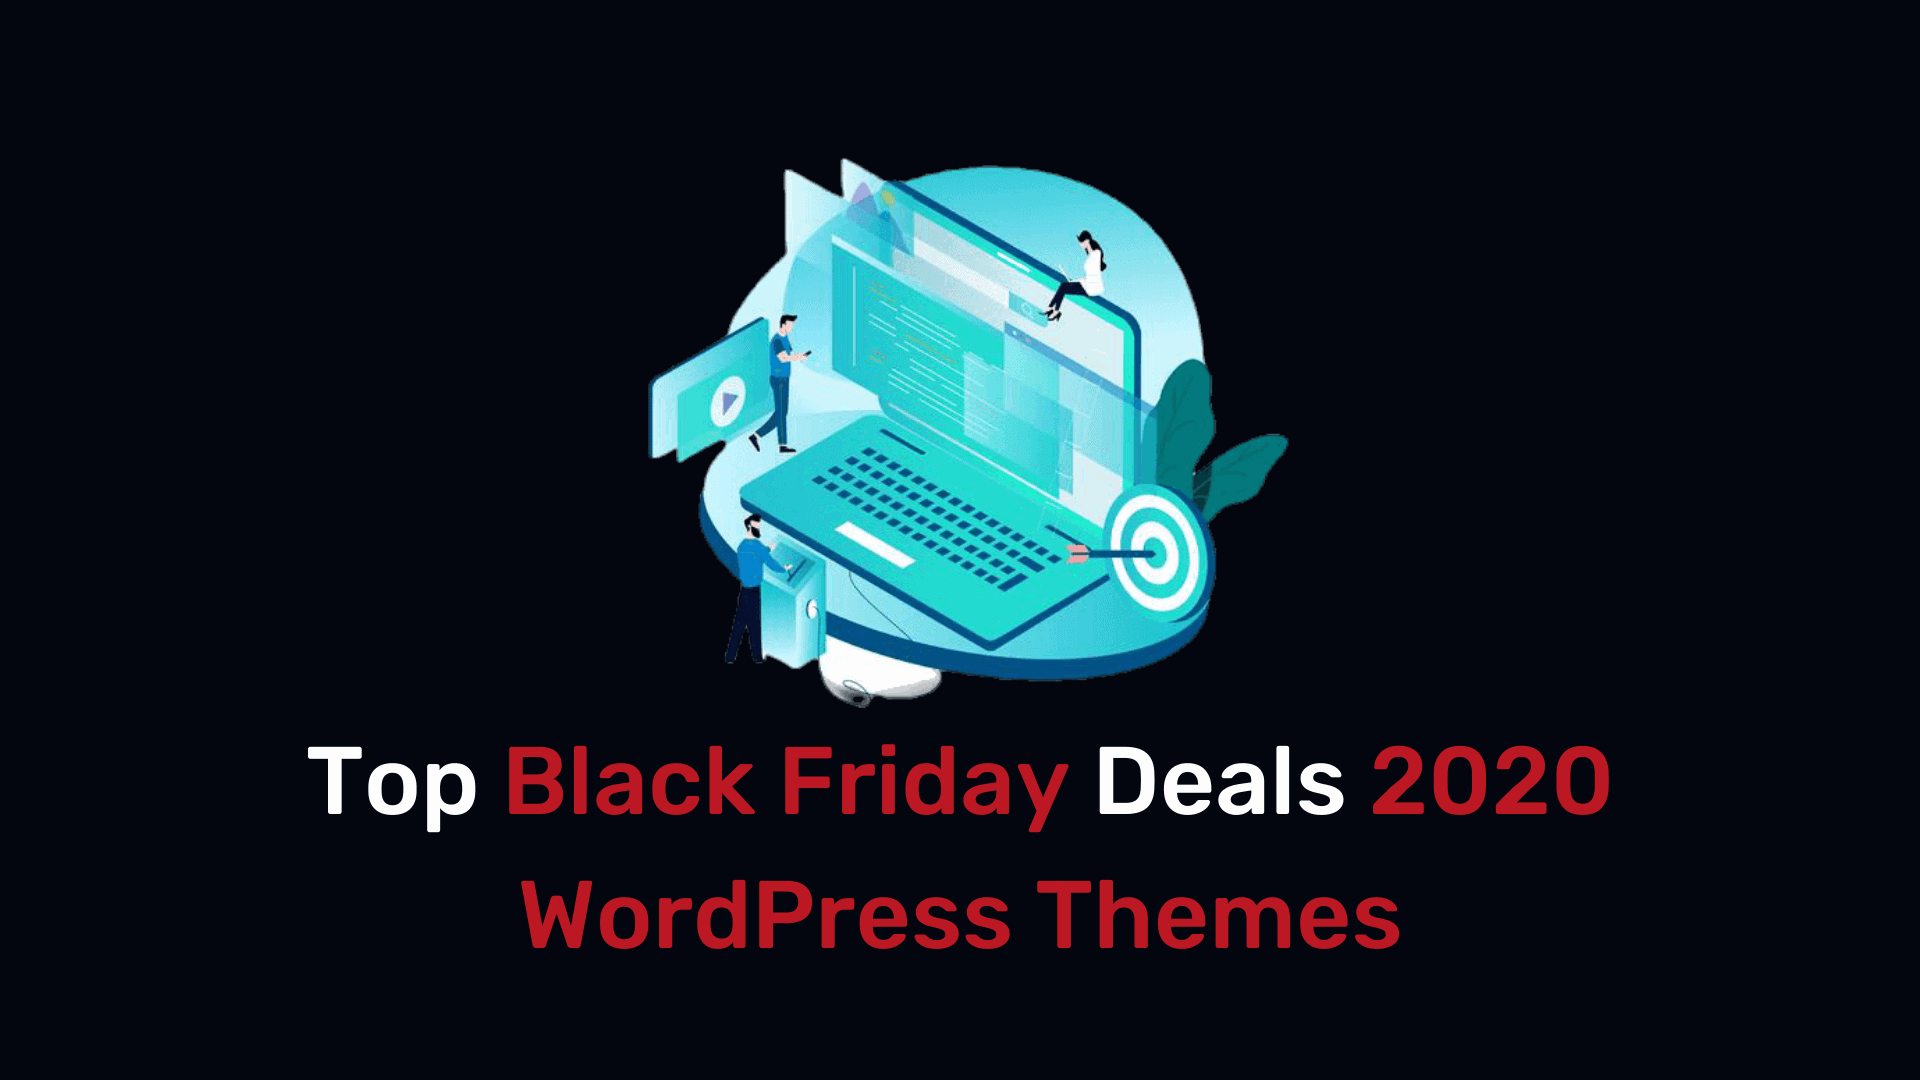 Black Friday Cyber Monday WordPress Theme Deals